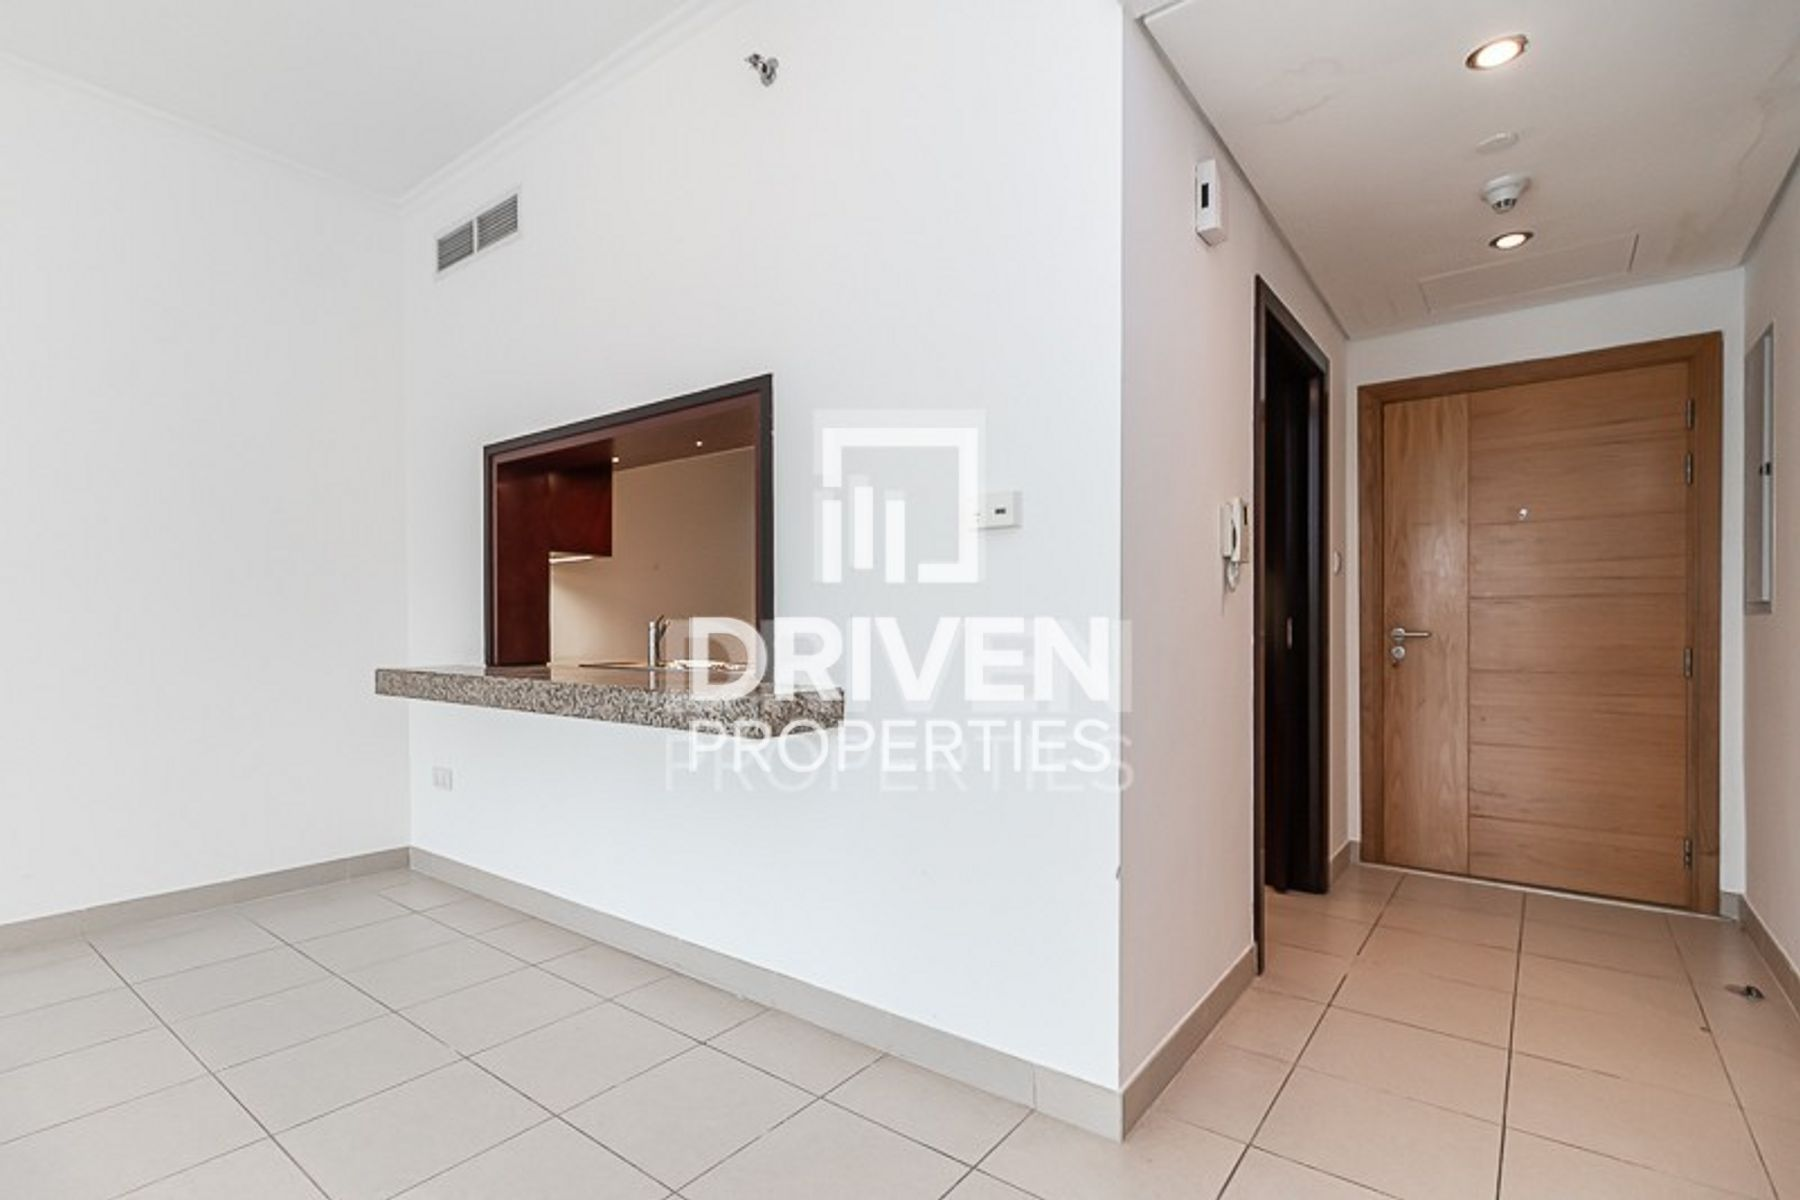 Apartment for Sale in Burj Views podium - Downtown Dubai